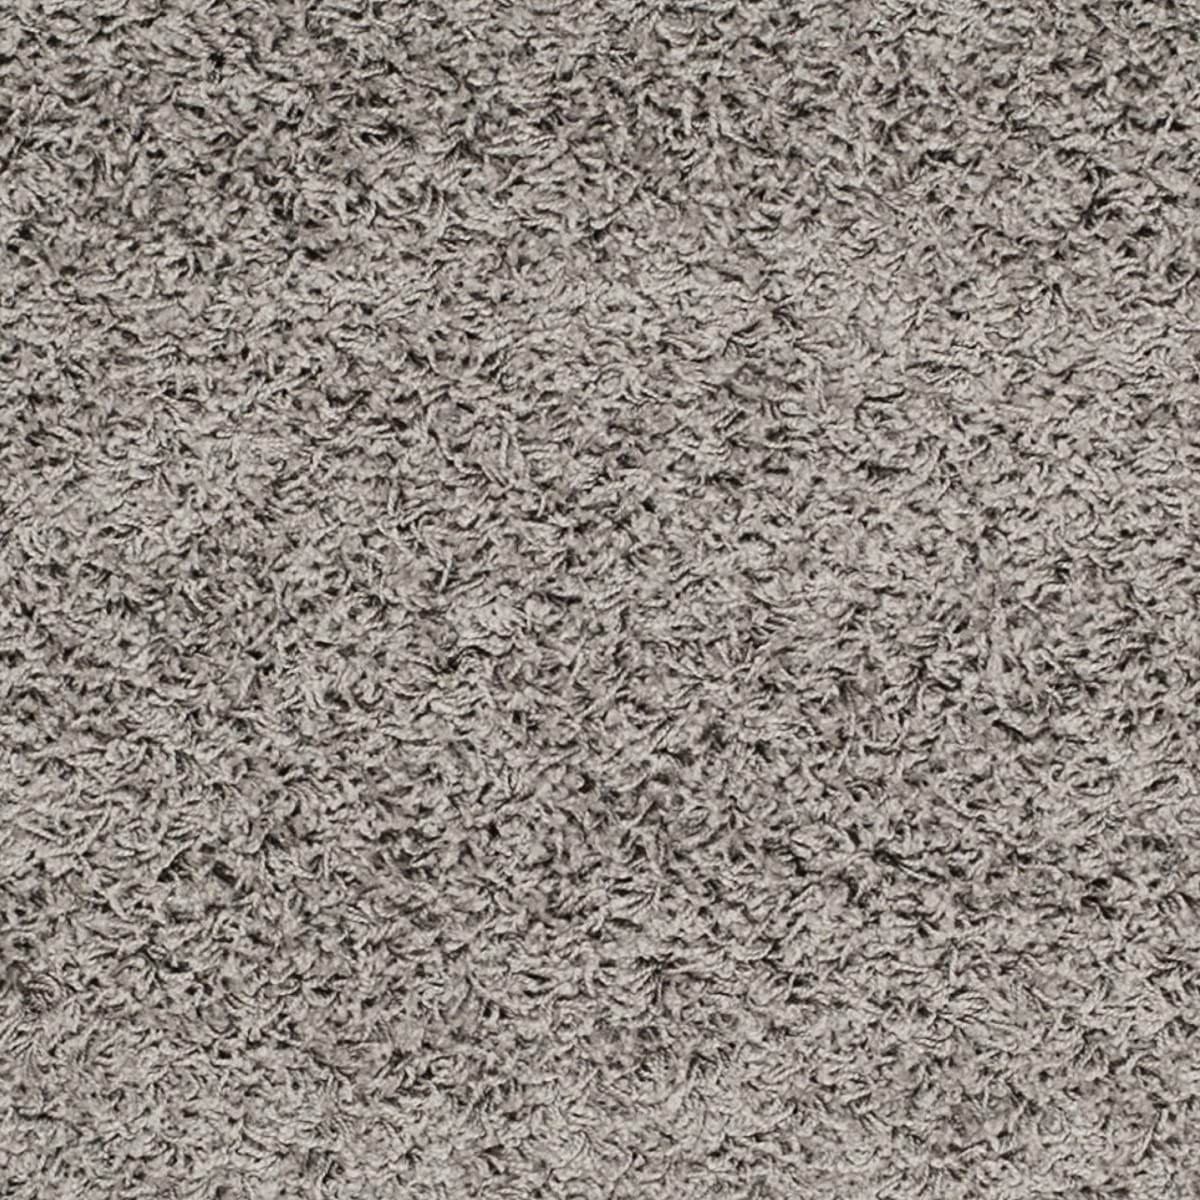 Safavieh Athens Shag Collection SGA119F Light Grey Area Rug (8 x 10)